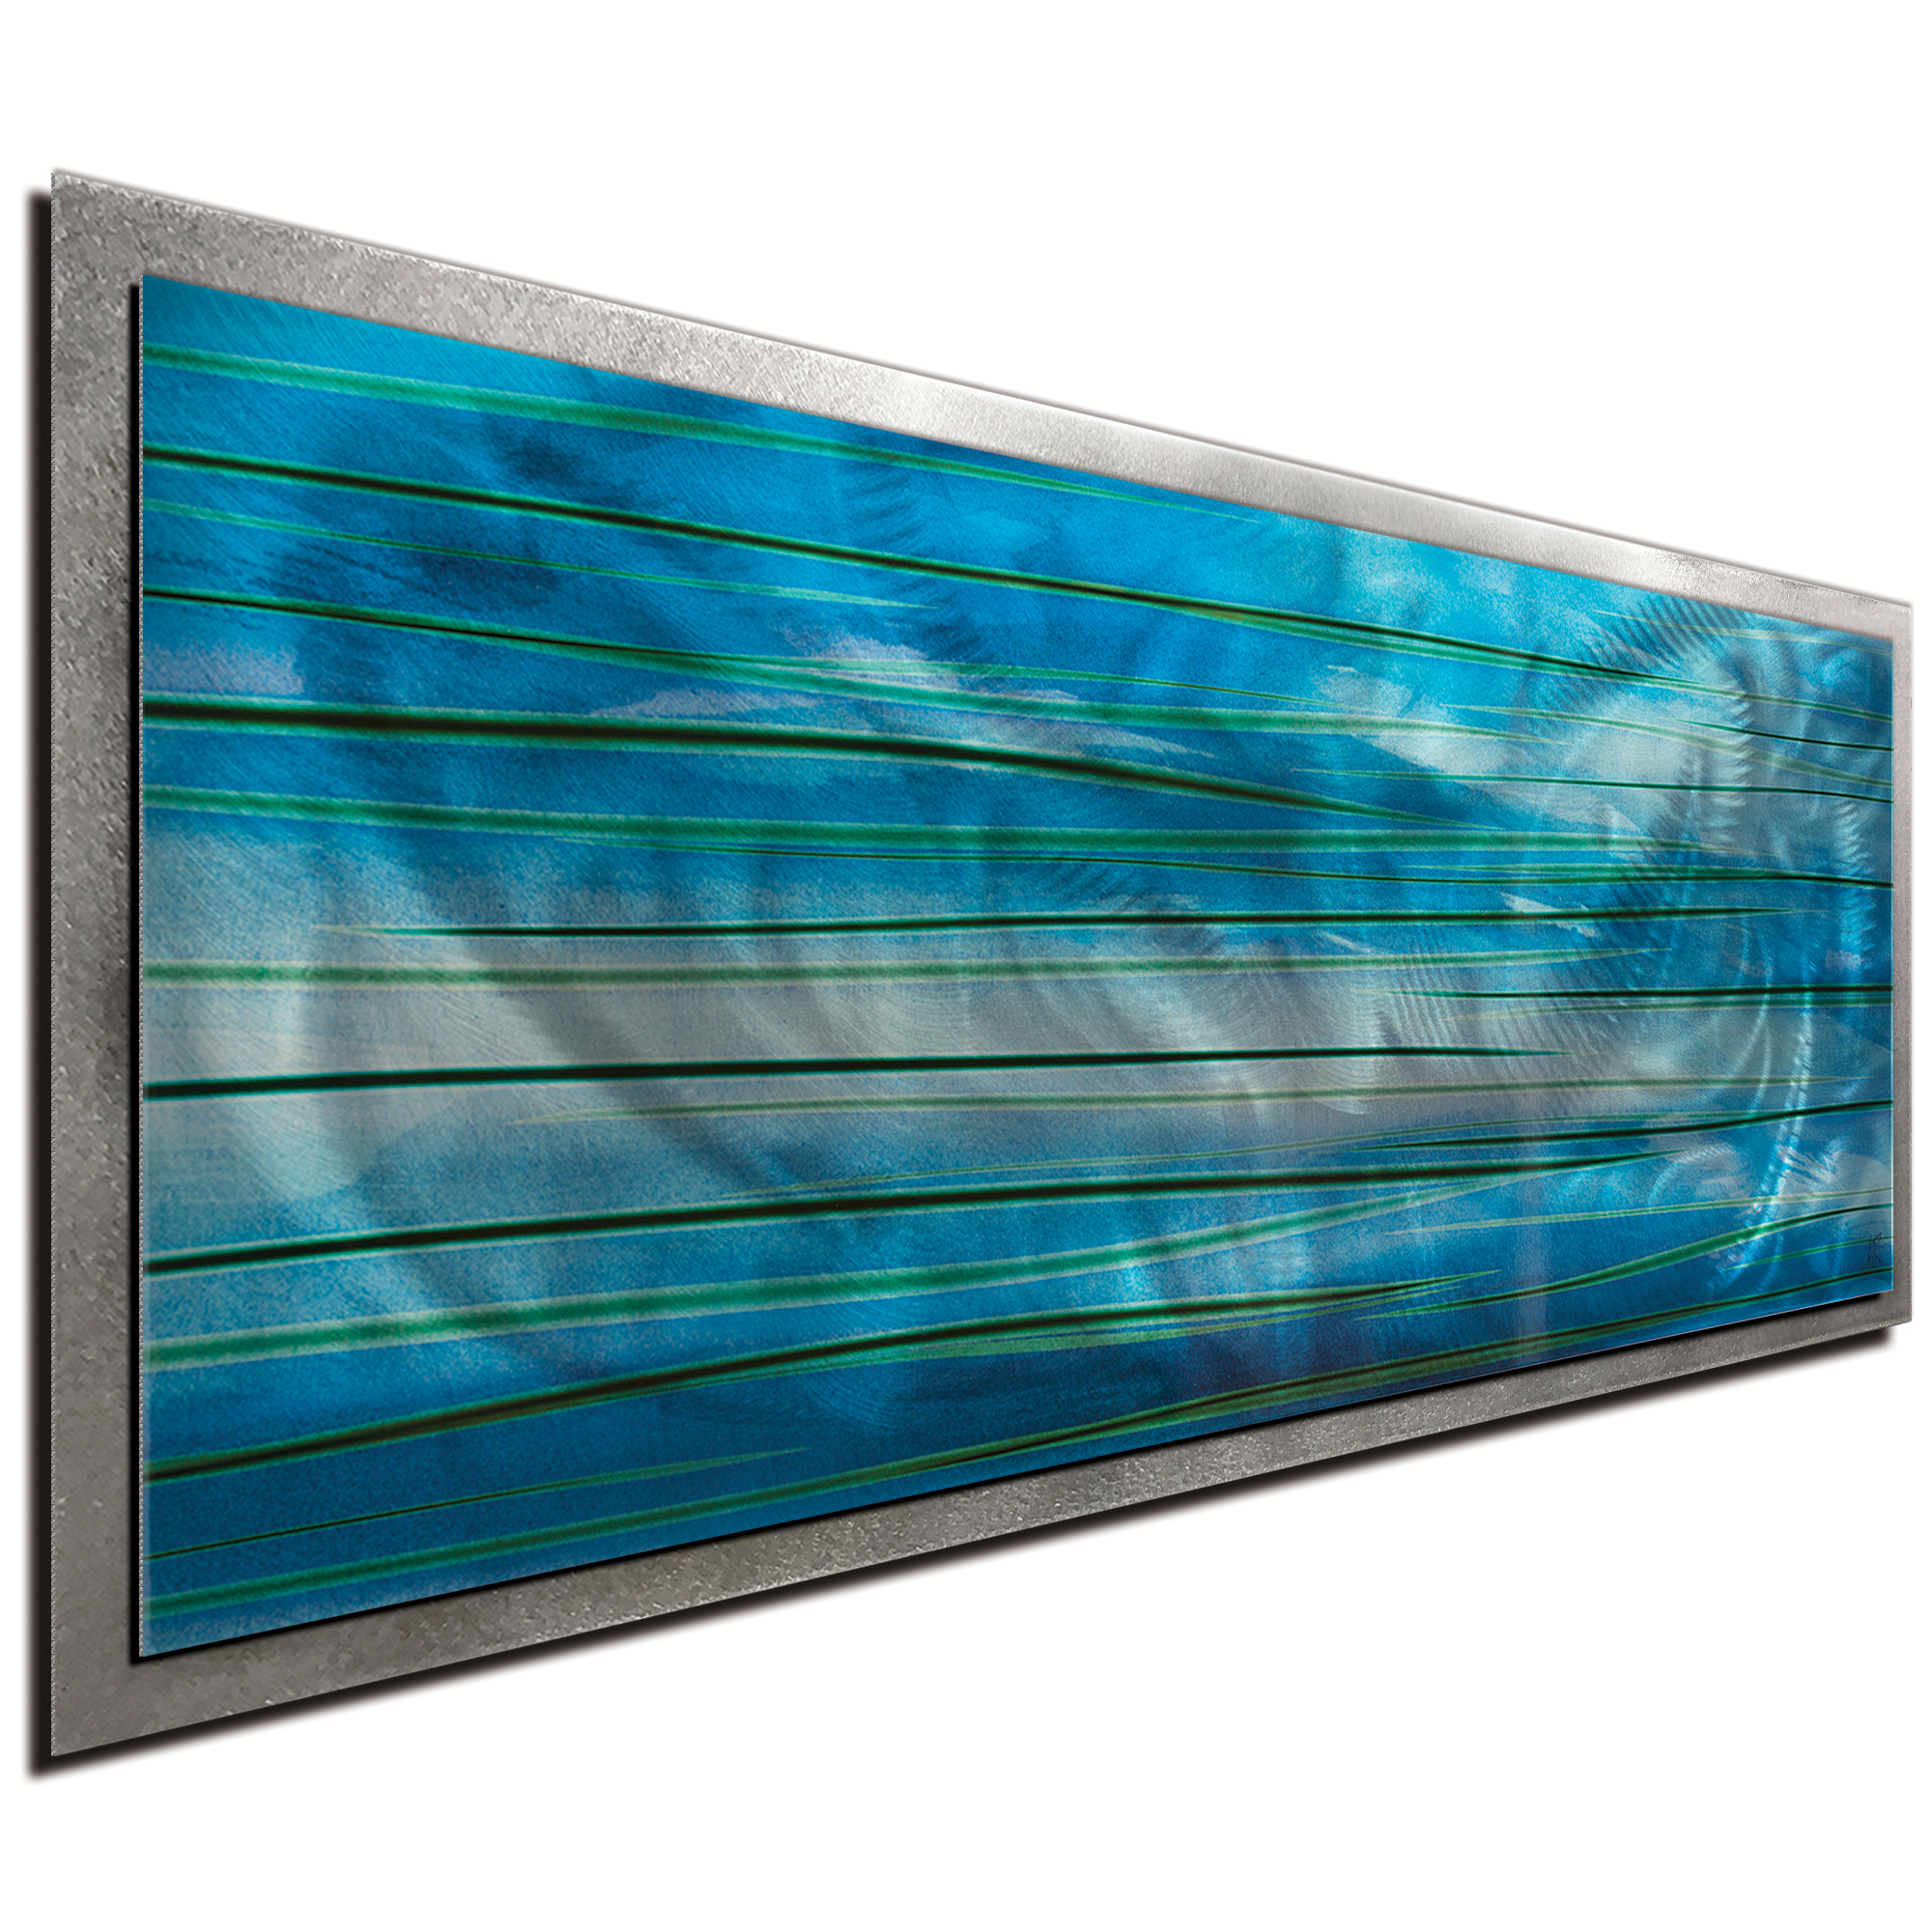 Ocean View Framed - Image 2